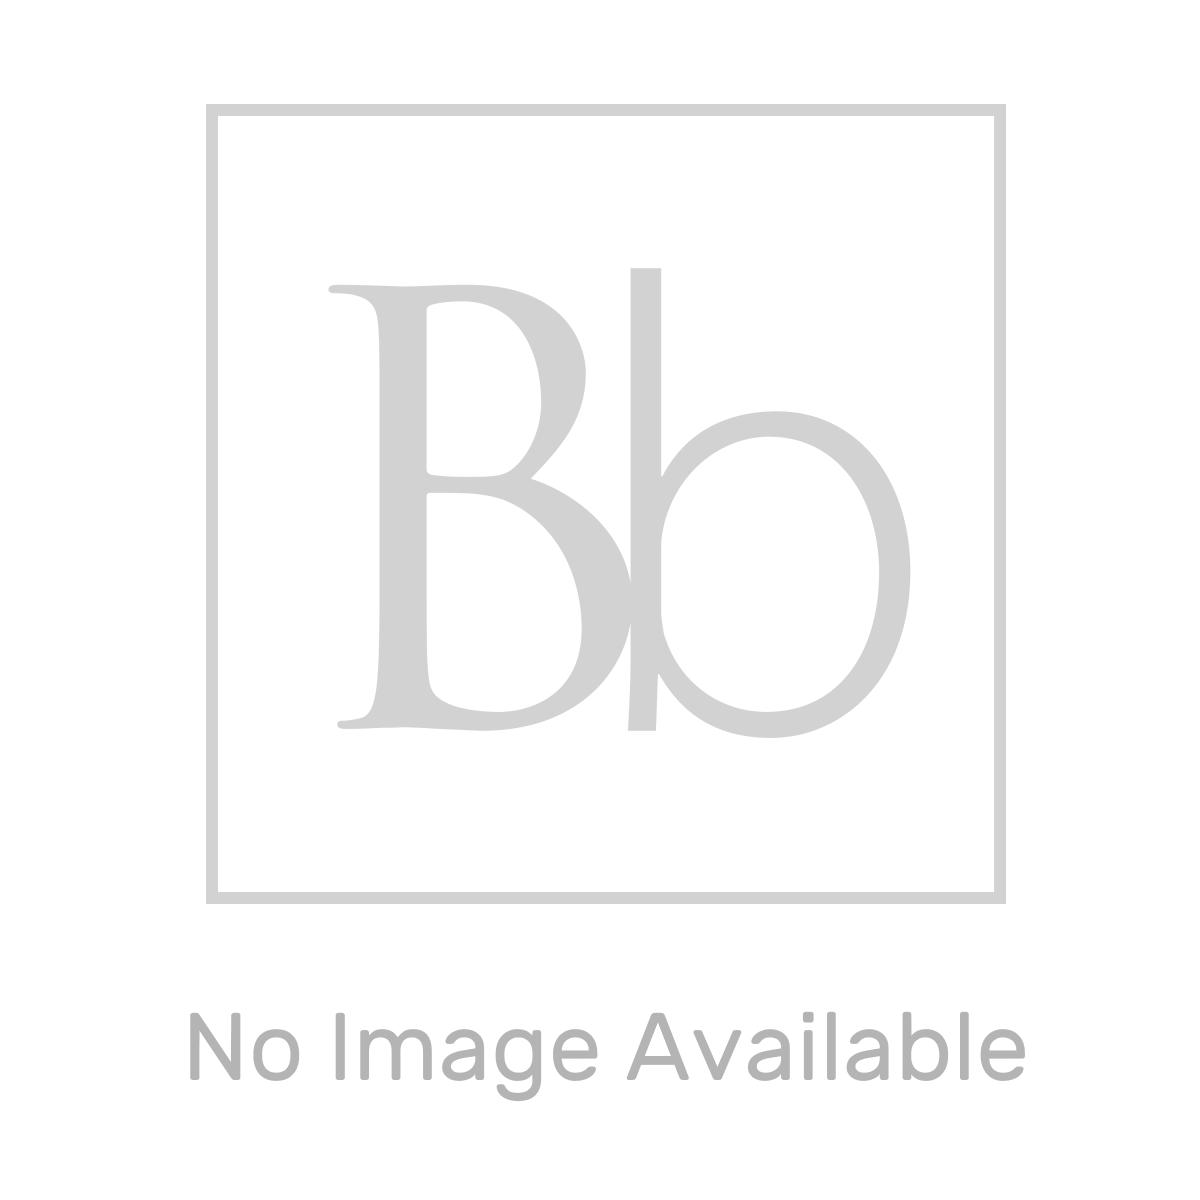 RAK Surface Outdoor Dark Greige Matt Tile 600 x 600mm